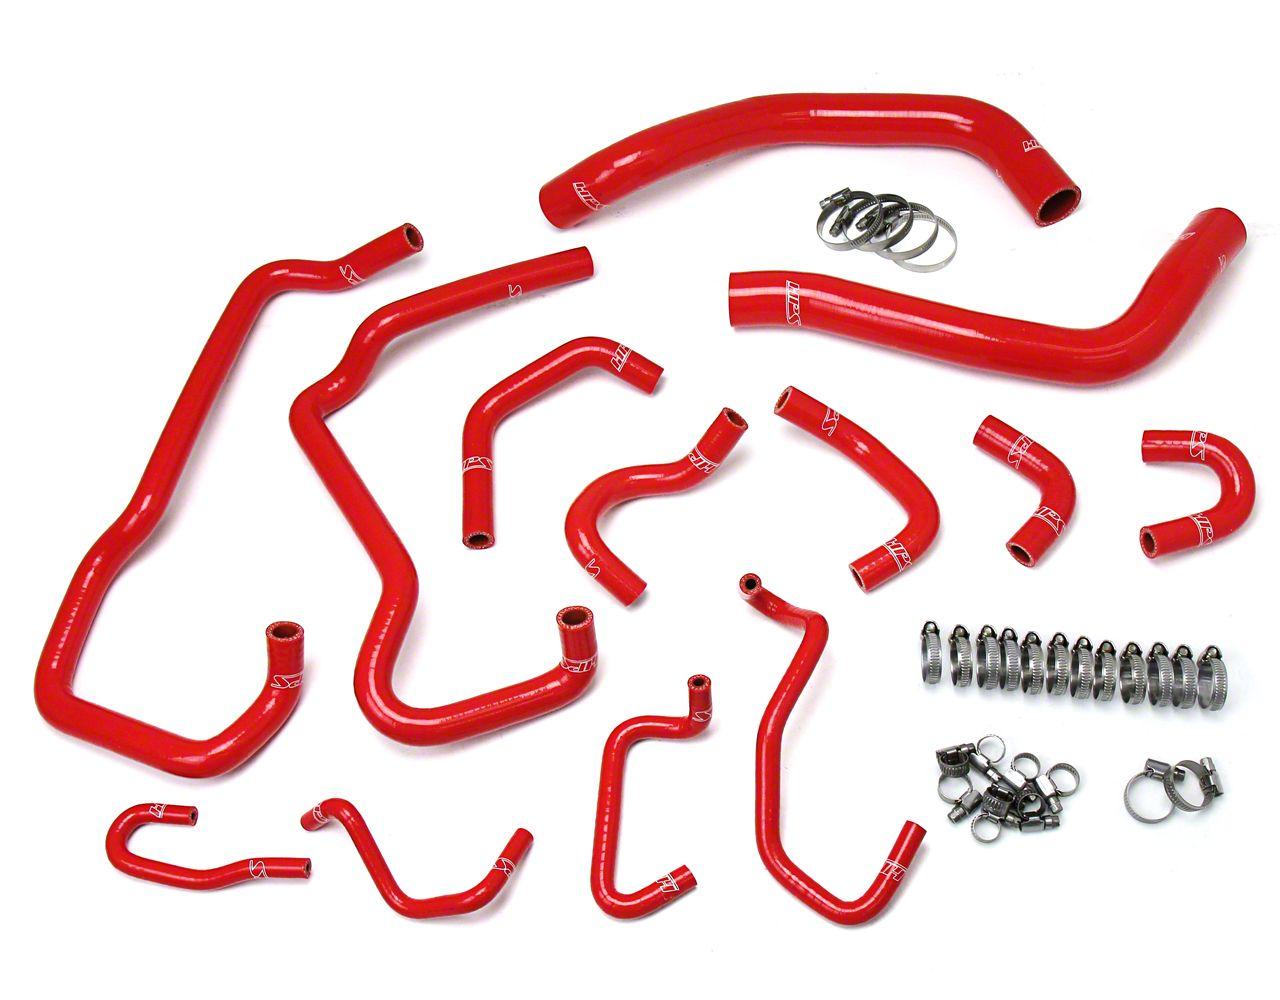 HPS Silicone Radiator Coolant & Heater Hose - Red (16-19 3.5L Tacoma)